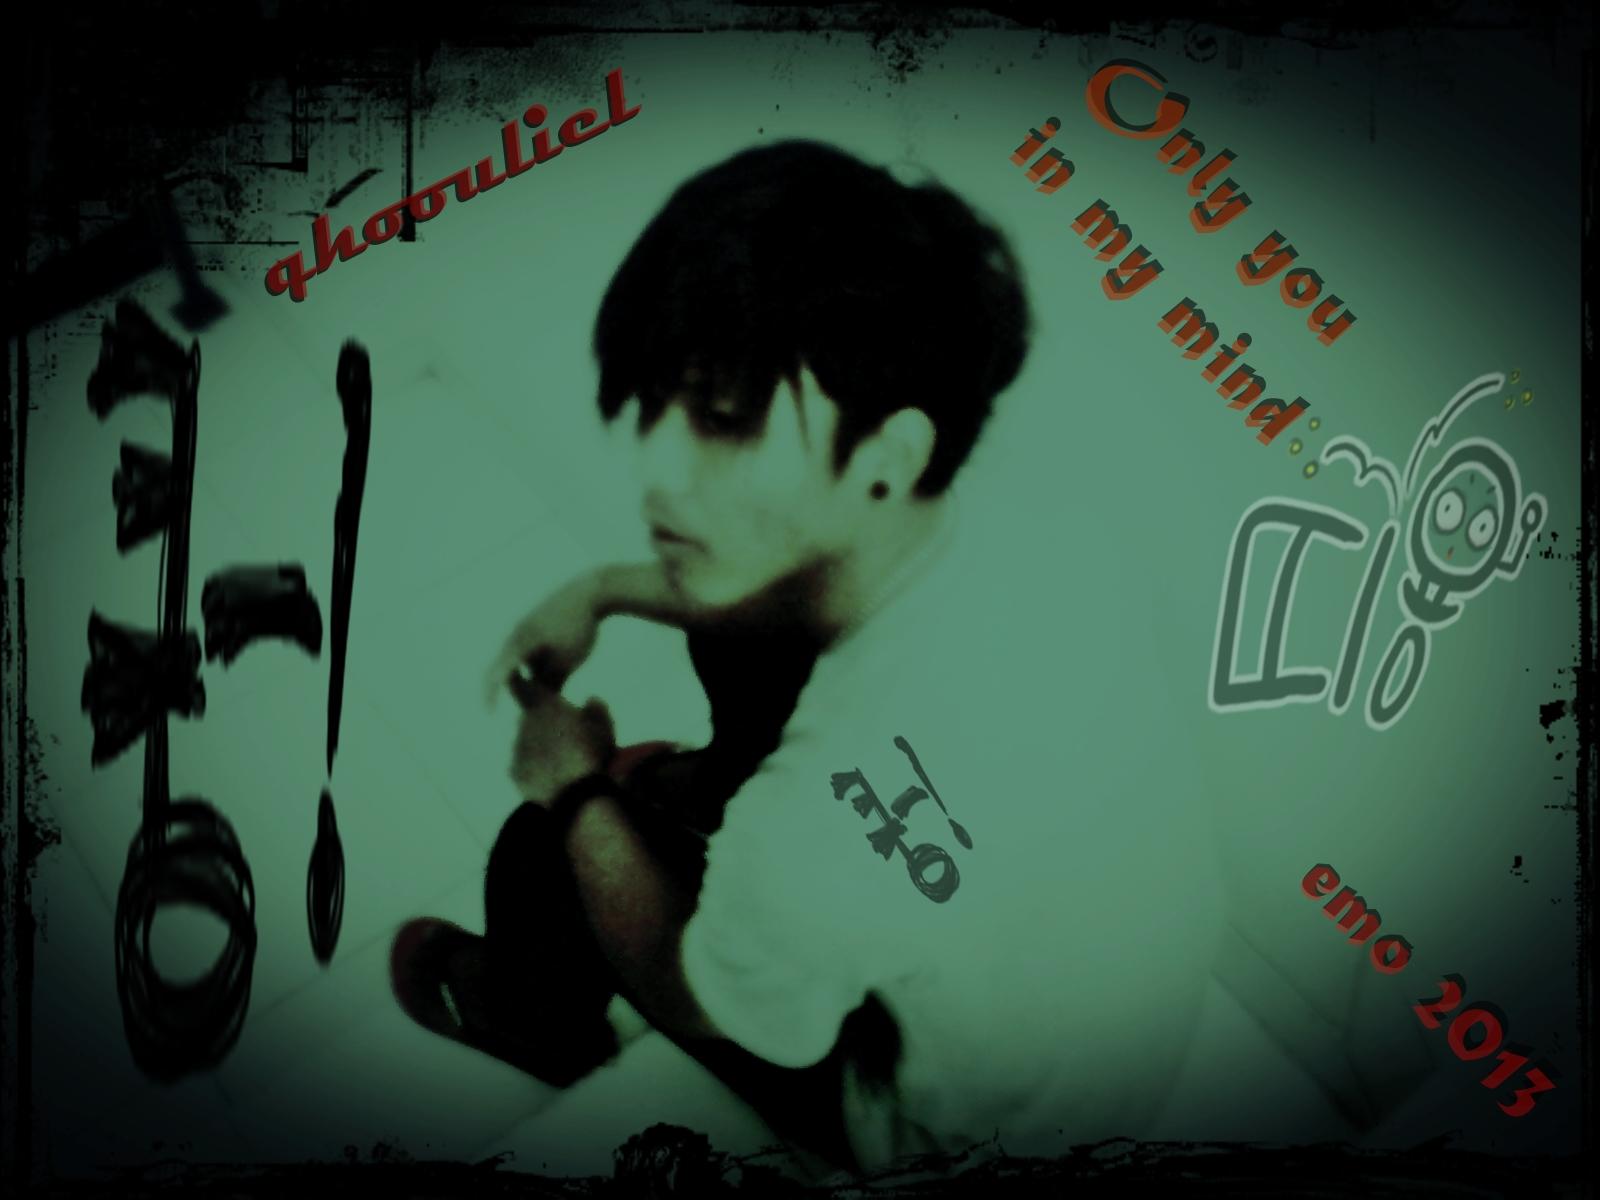 Anime Emo Boy Wallpaper Qhoouliel Abcd Emo Love Wallpaper 33711017 Fanpop